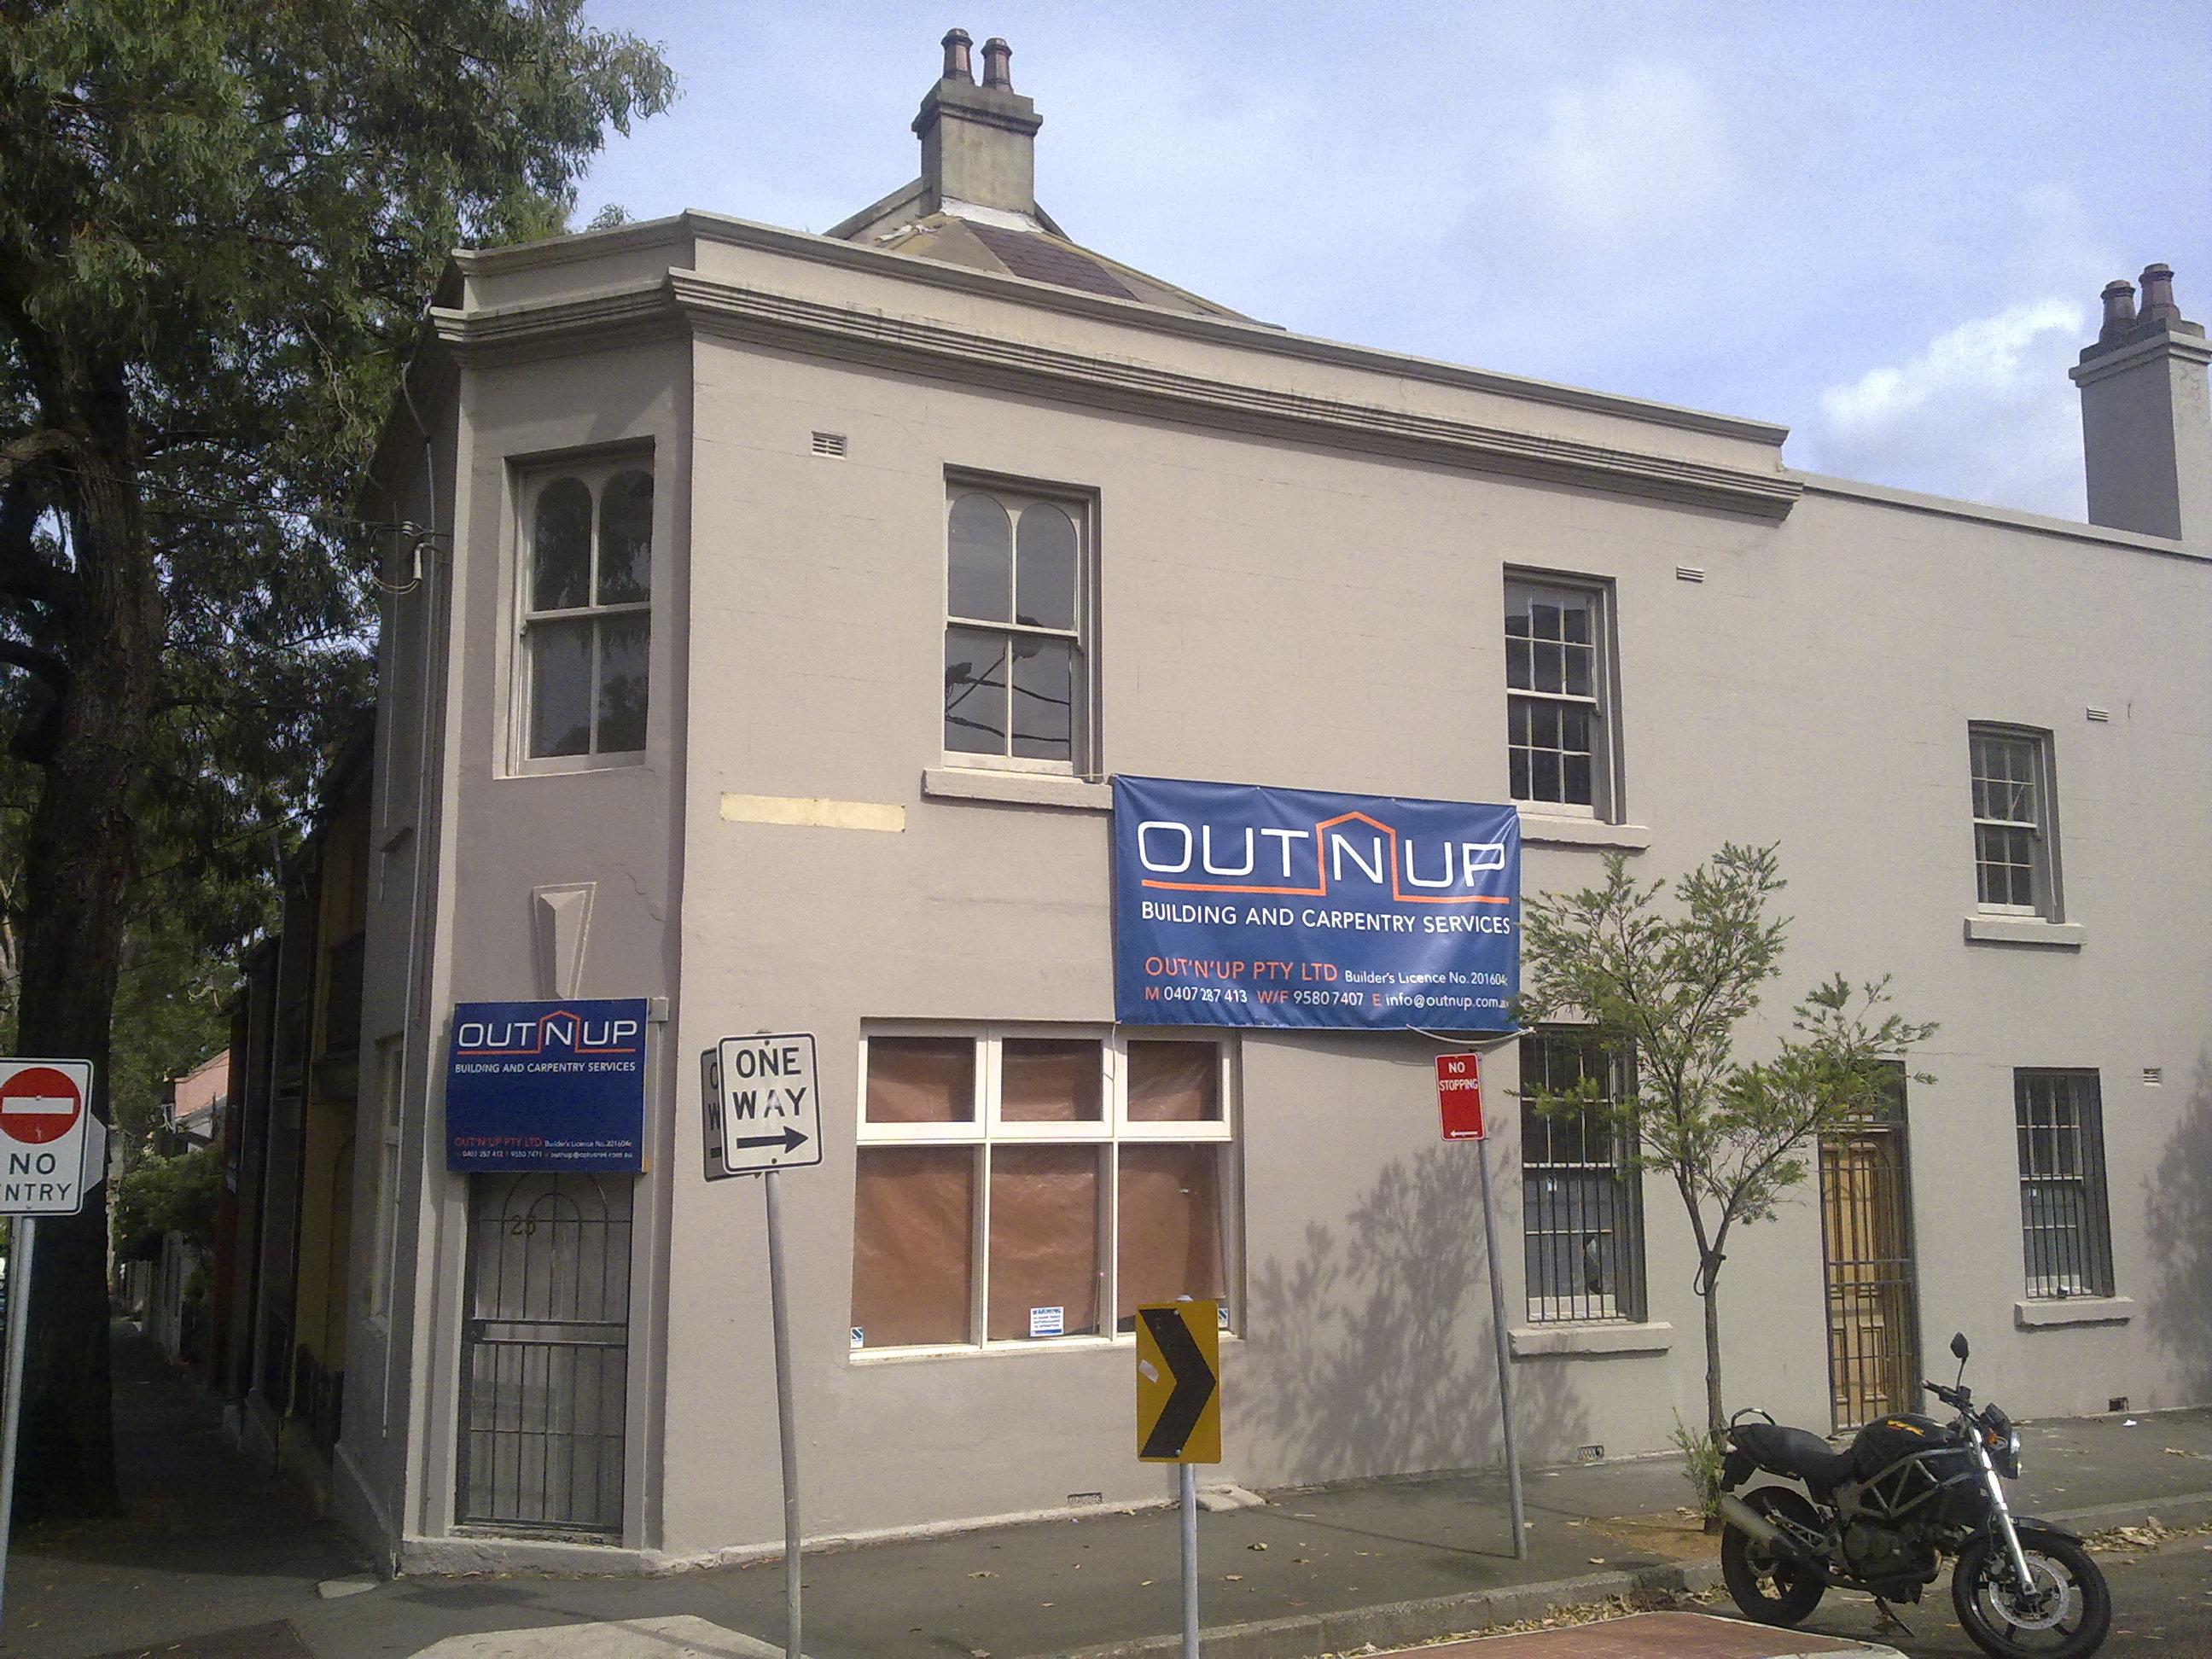 Lansdowne Street in Surry Hills